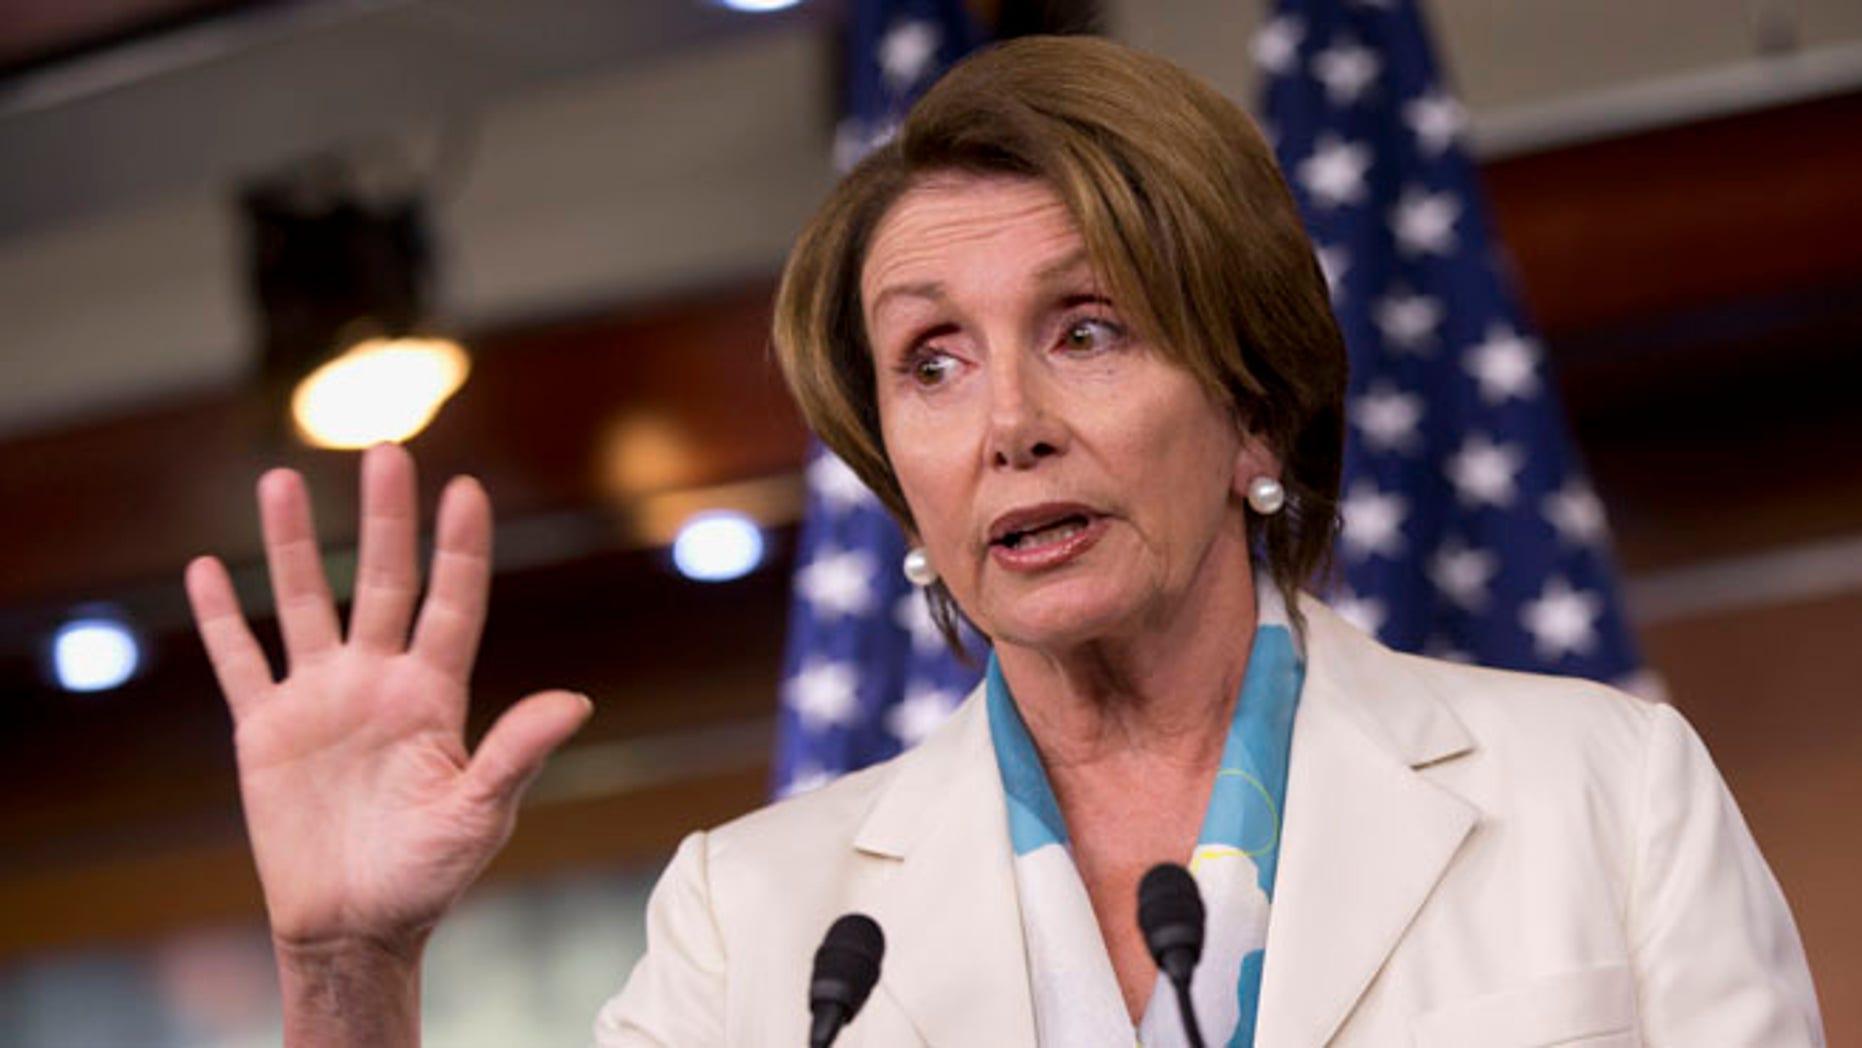 FILE: July 11, 2013: House Minority Leader Nancy Pelosi speaks to reporters on Capitol Hill in Washington, D.C.